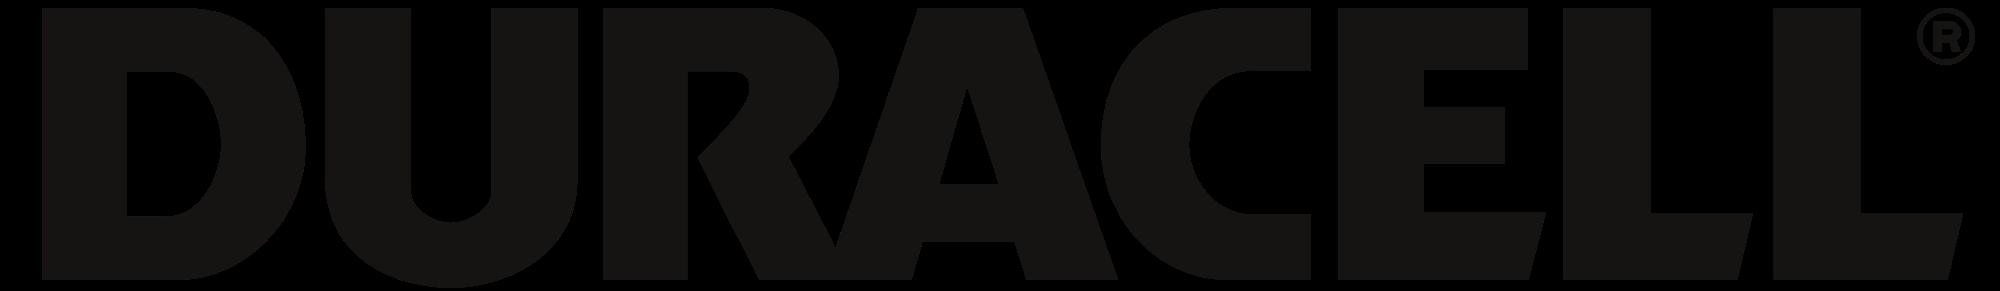 2000px-Duracell_logo.svg